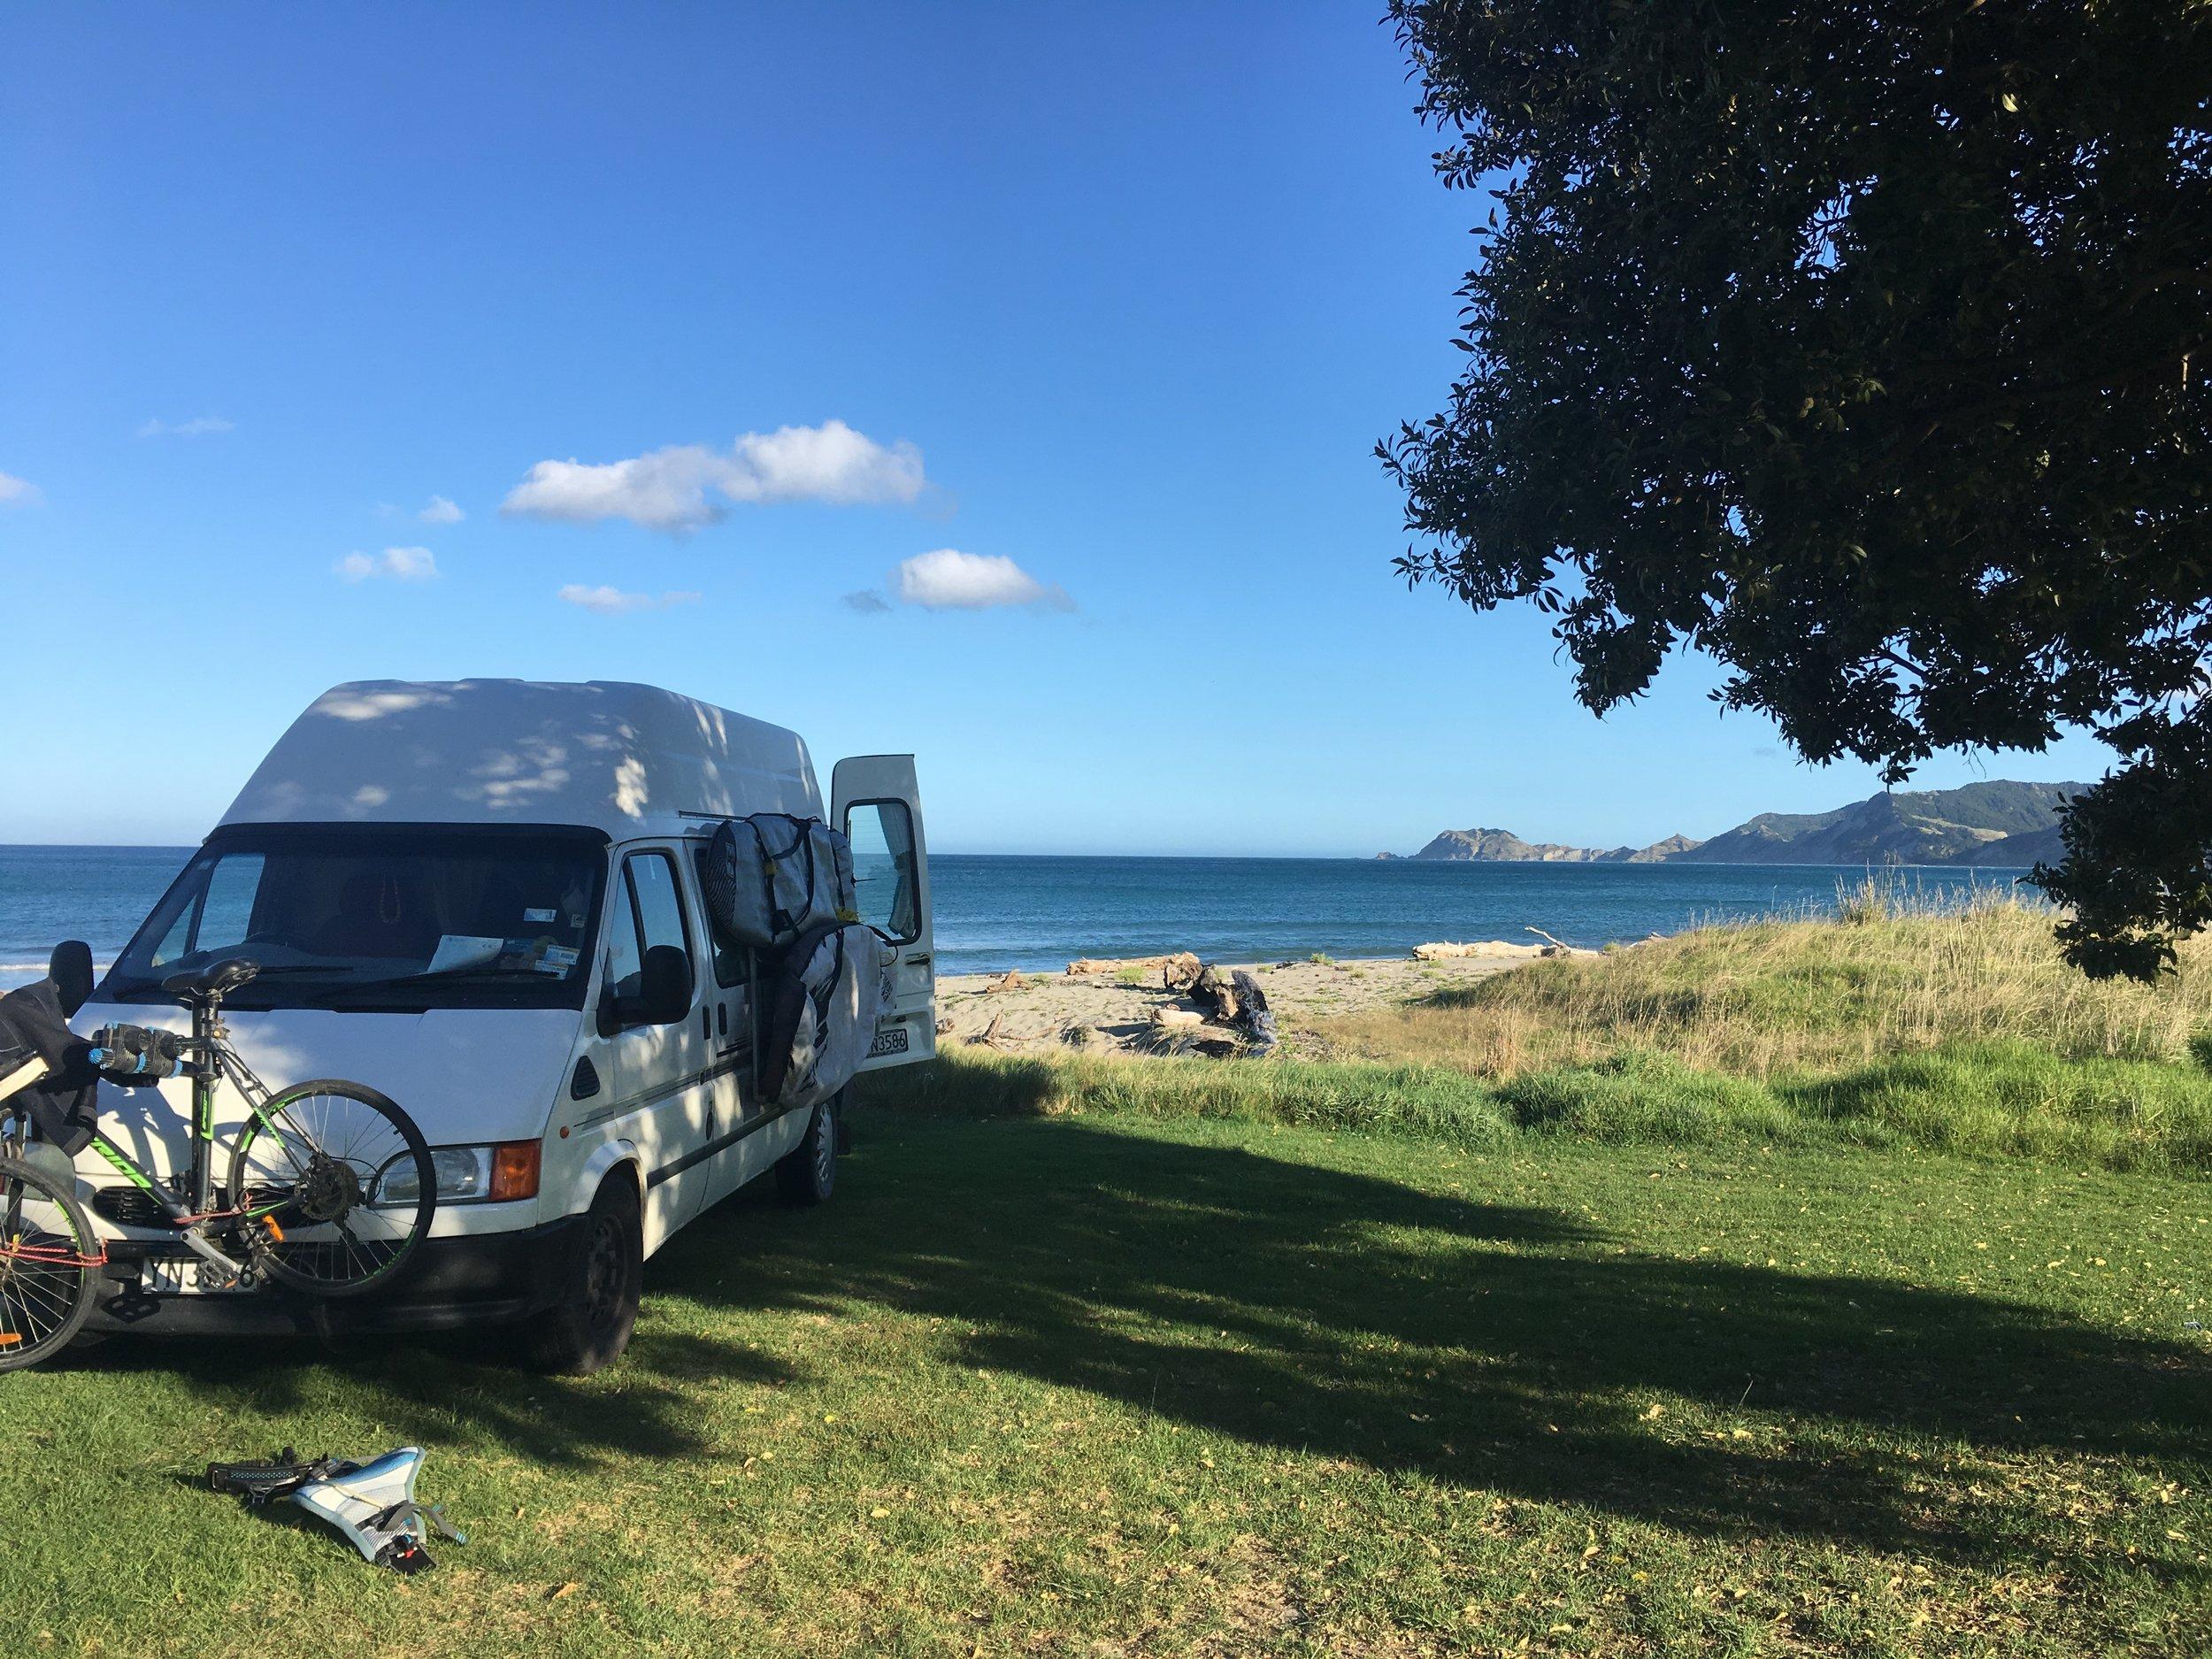 Beach front parking in Tokomaru Bay